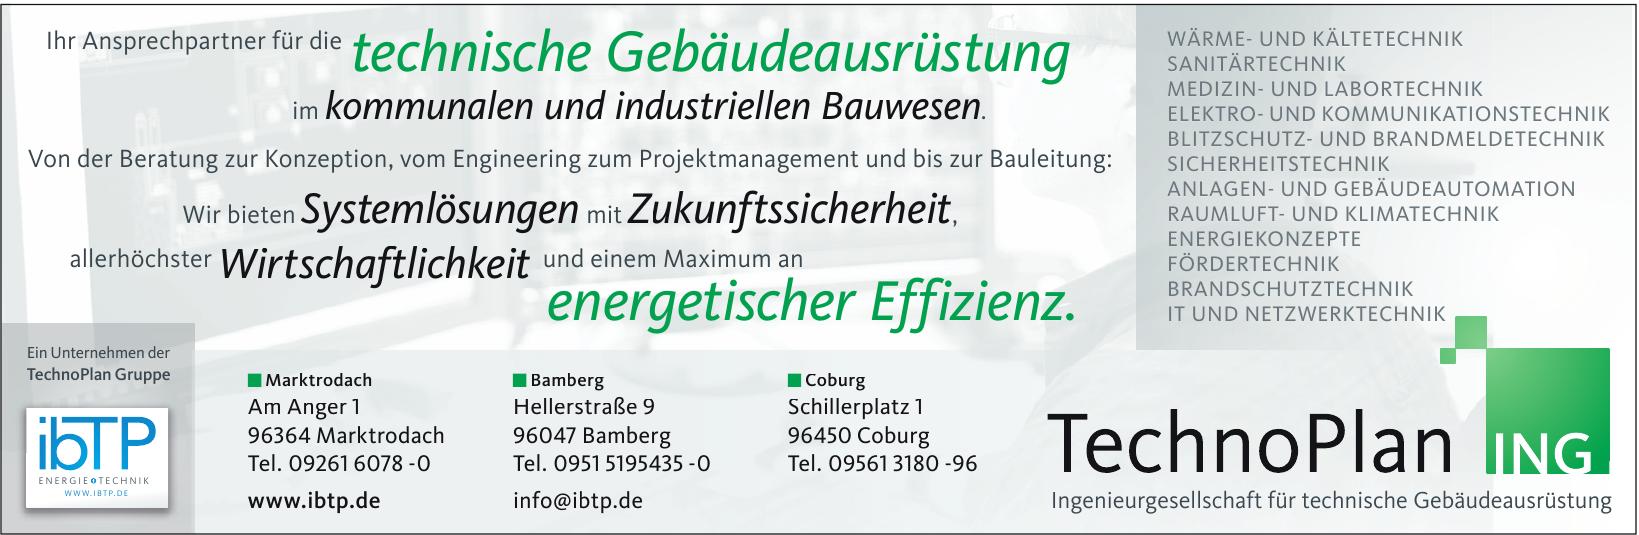 TechnoPlan Gruppe